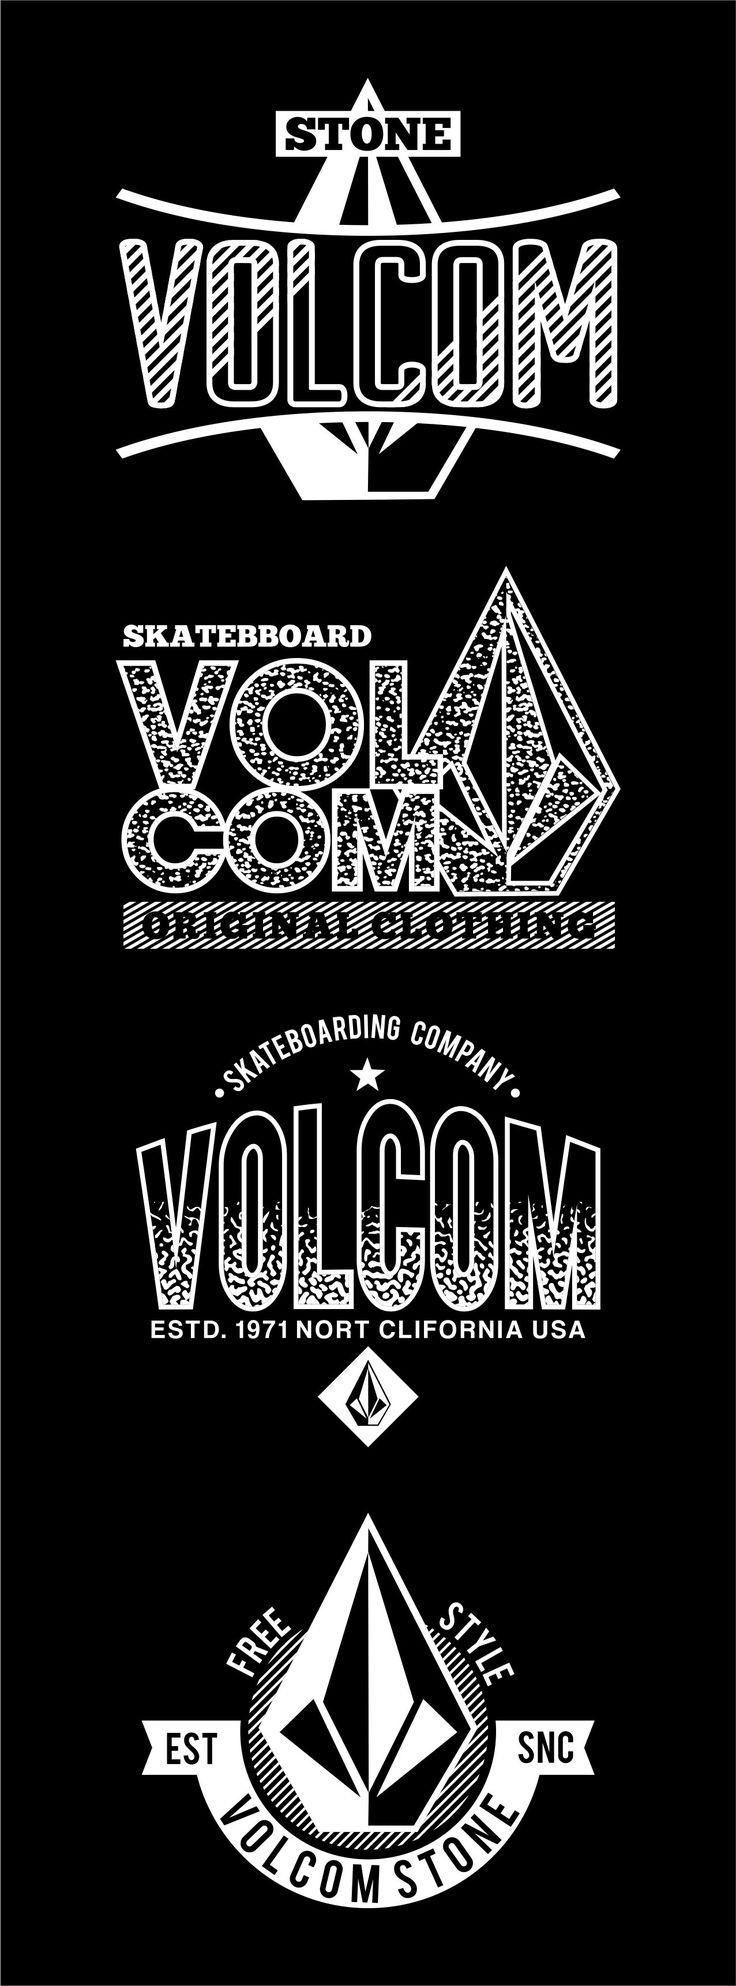 Vintage Vector Volcom #vintage #vector #vintagevector #volcom #adidas #billabong #rusty #nike #puma #levis #quiksilver #ripcurl #dc #vans #spyderbilt #reebok